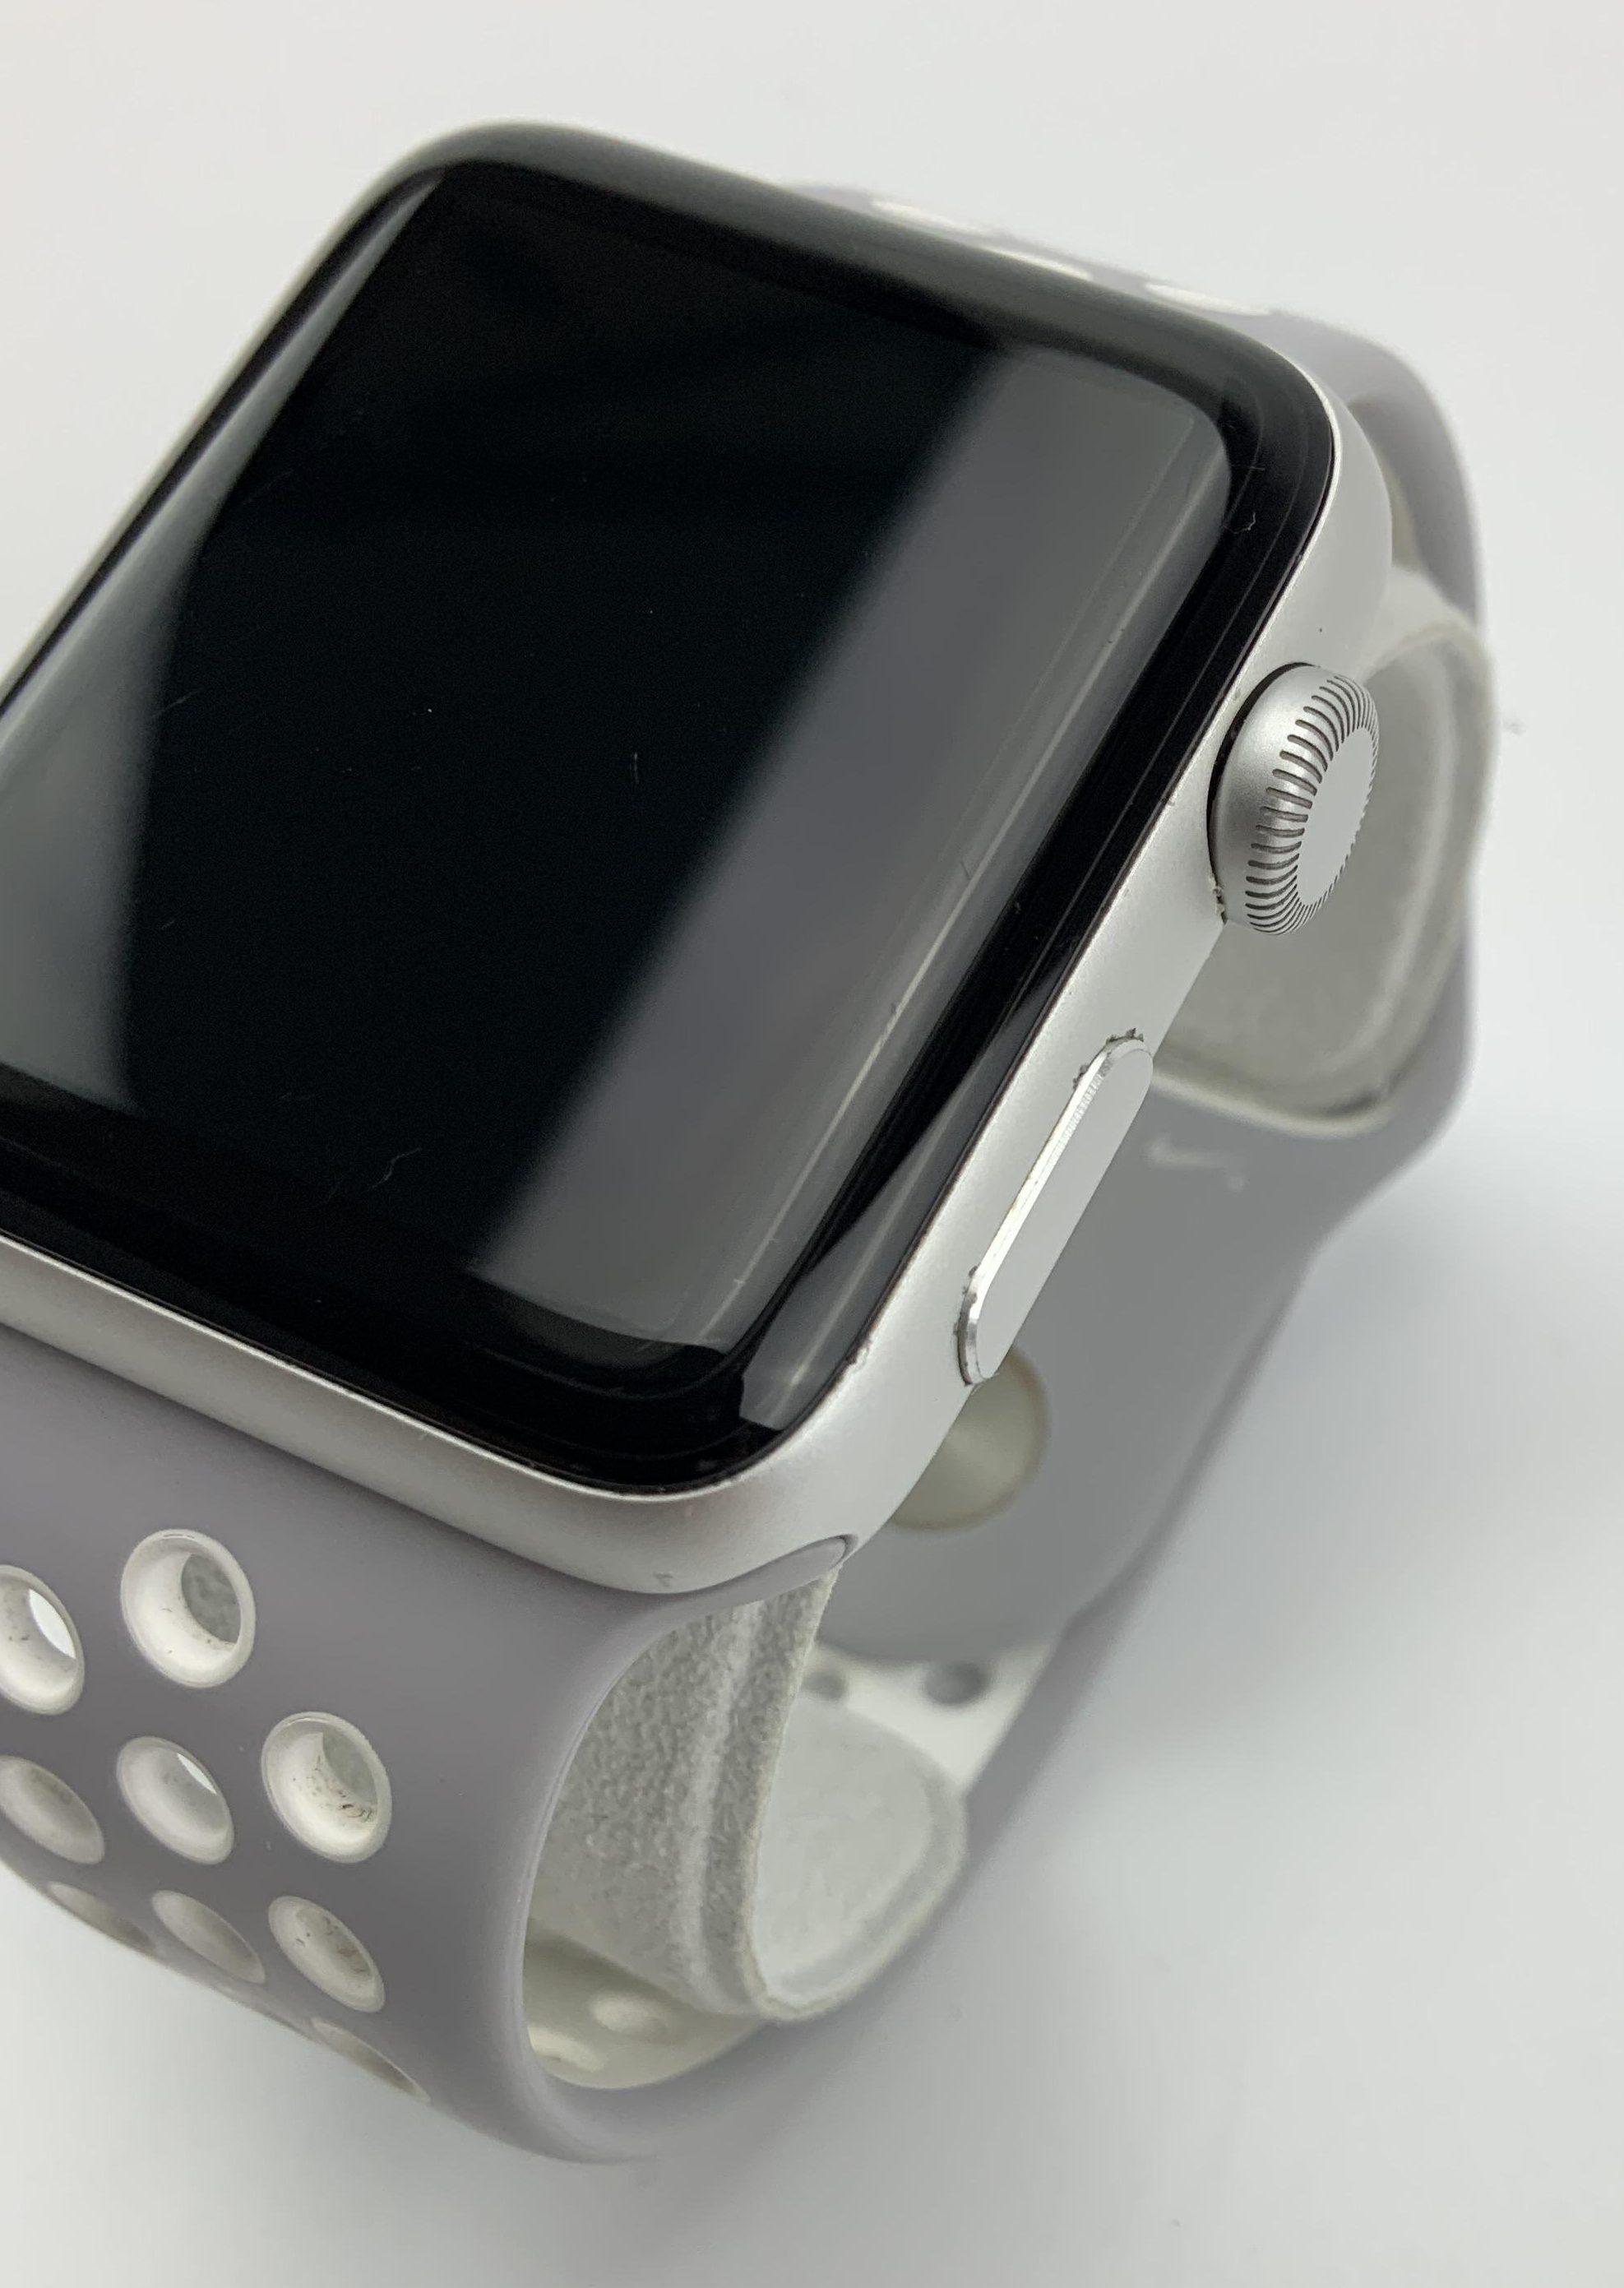 Watch Series 2 Aluminum (42mm), Silver, Grey Nike Sport Band, Bild 3